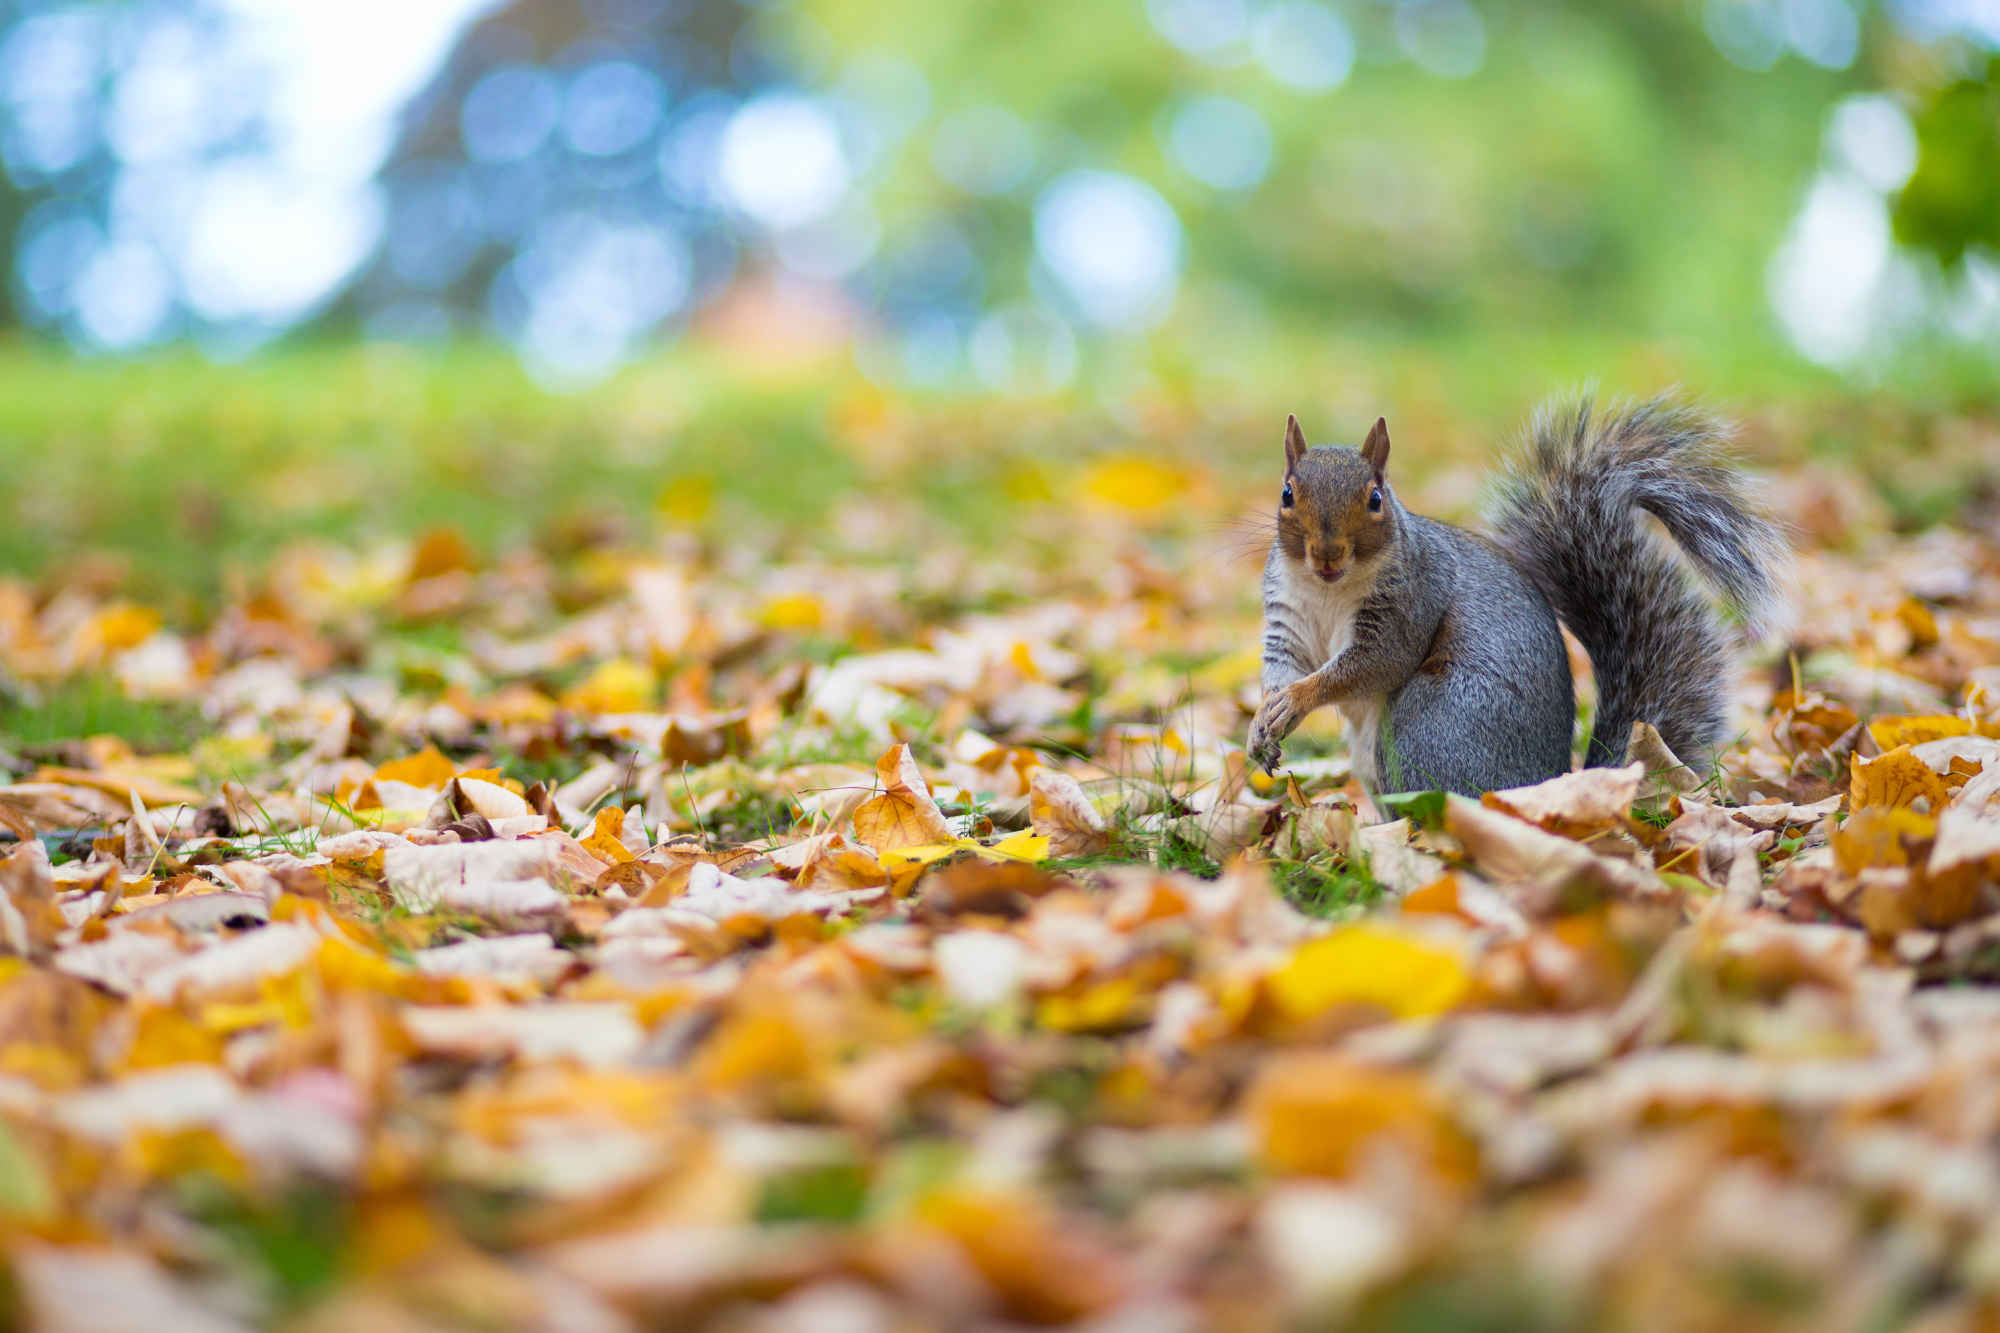 Grey Squirrel in autumn leaves